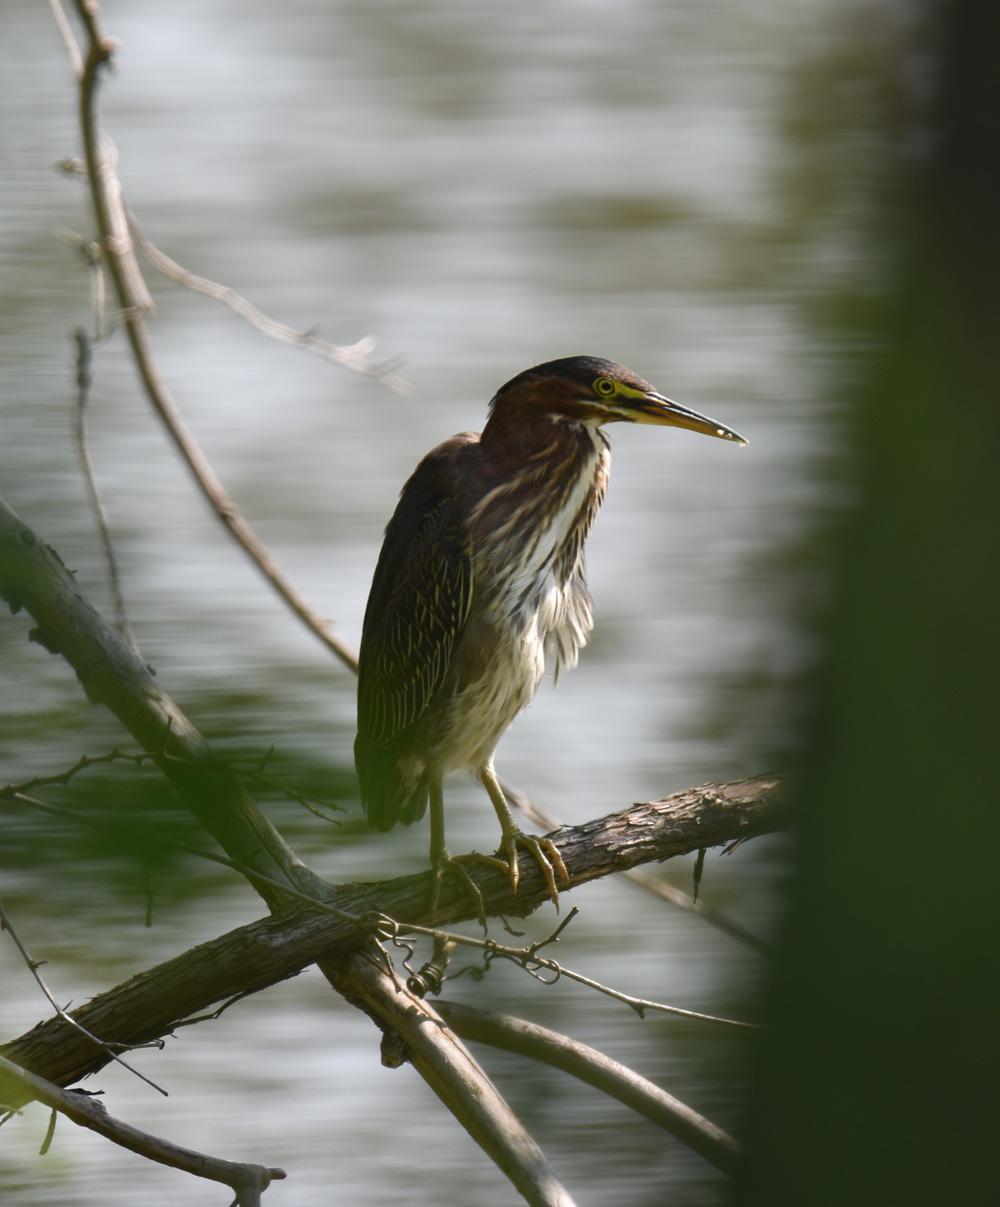 Photo of Green Heron 1 Urquhart on NaturalCrooksDotCom